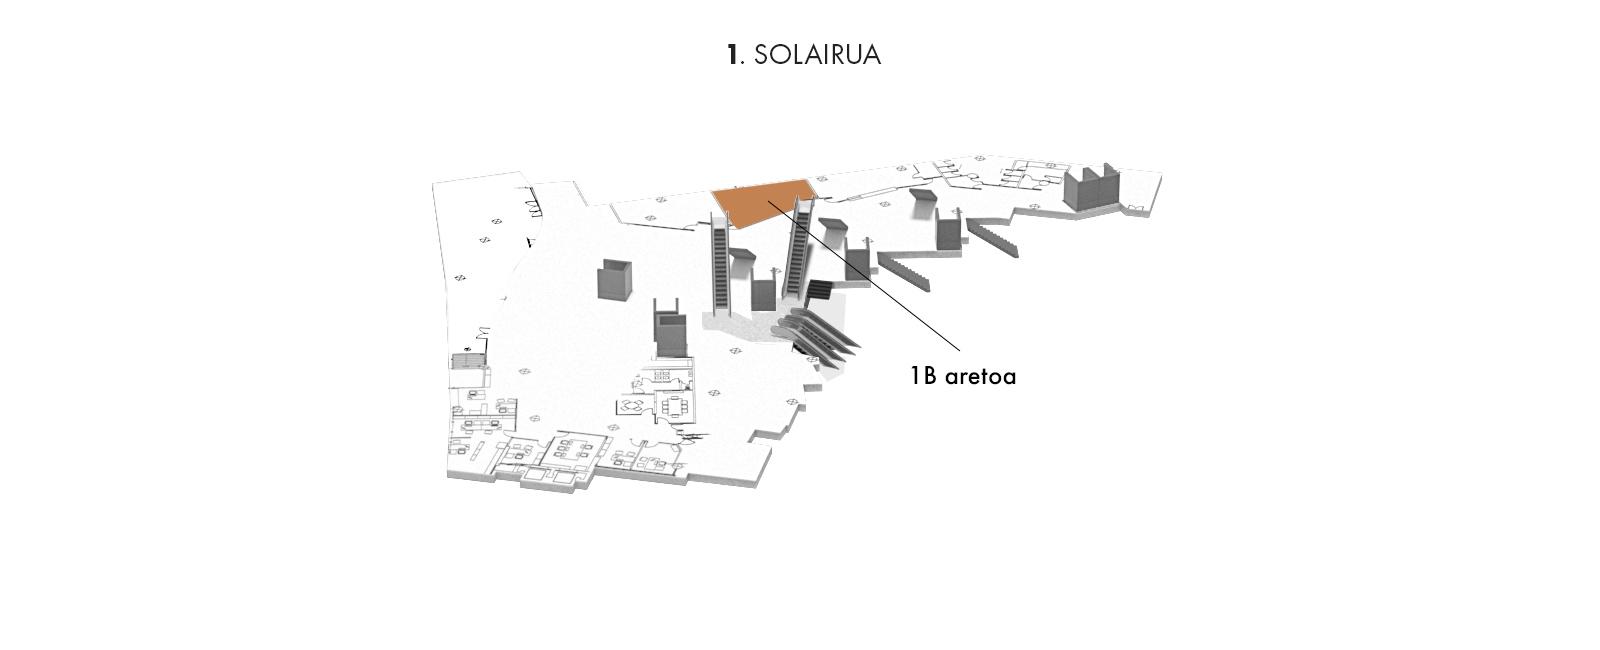 1B aretoa, 1. solairua | Palacio Euskalduna Jauregia